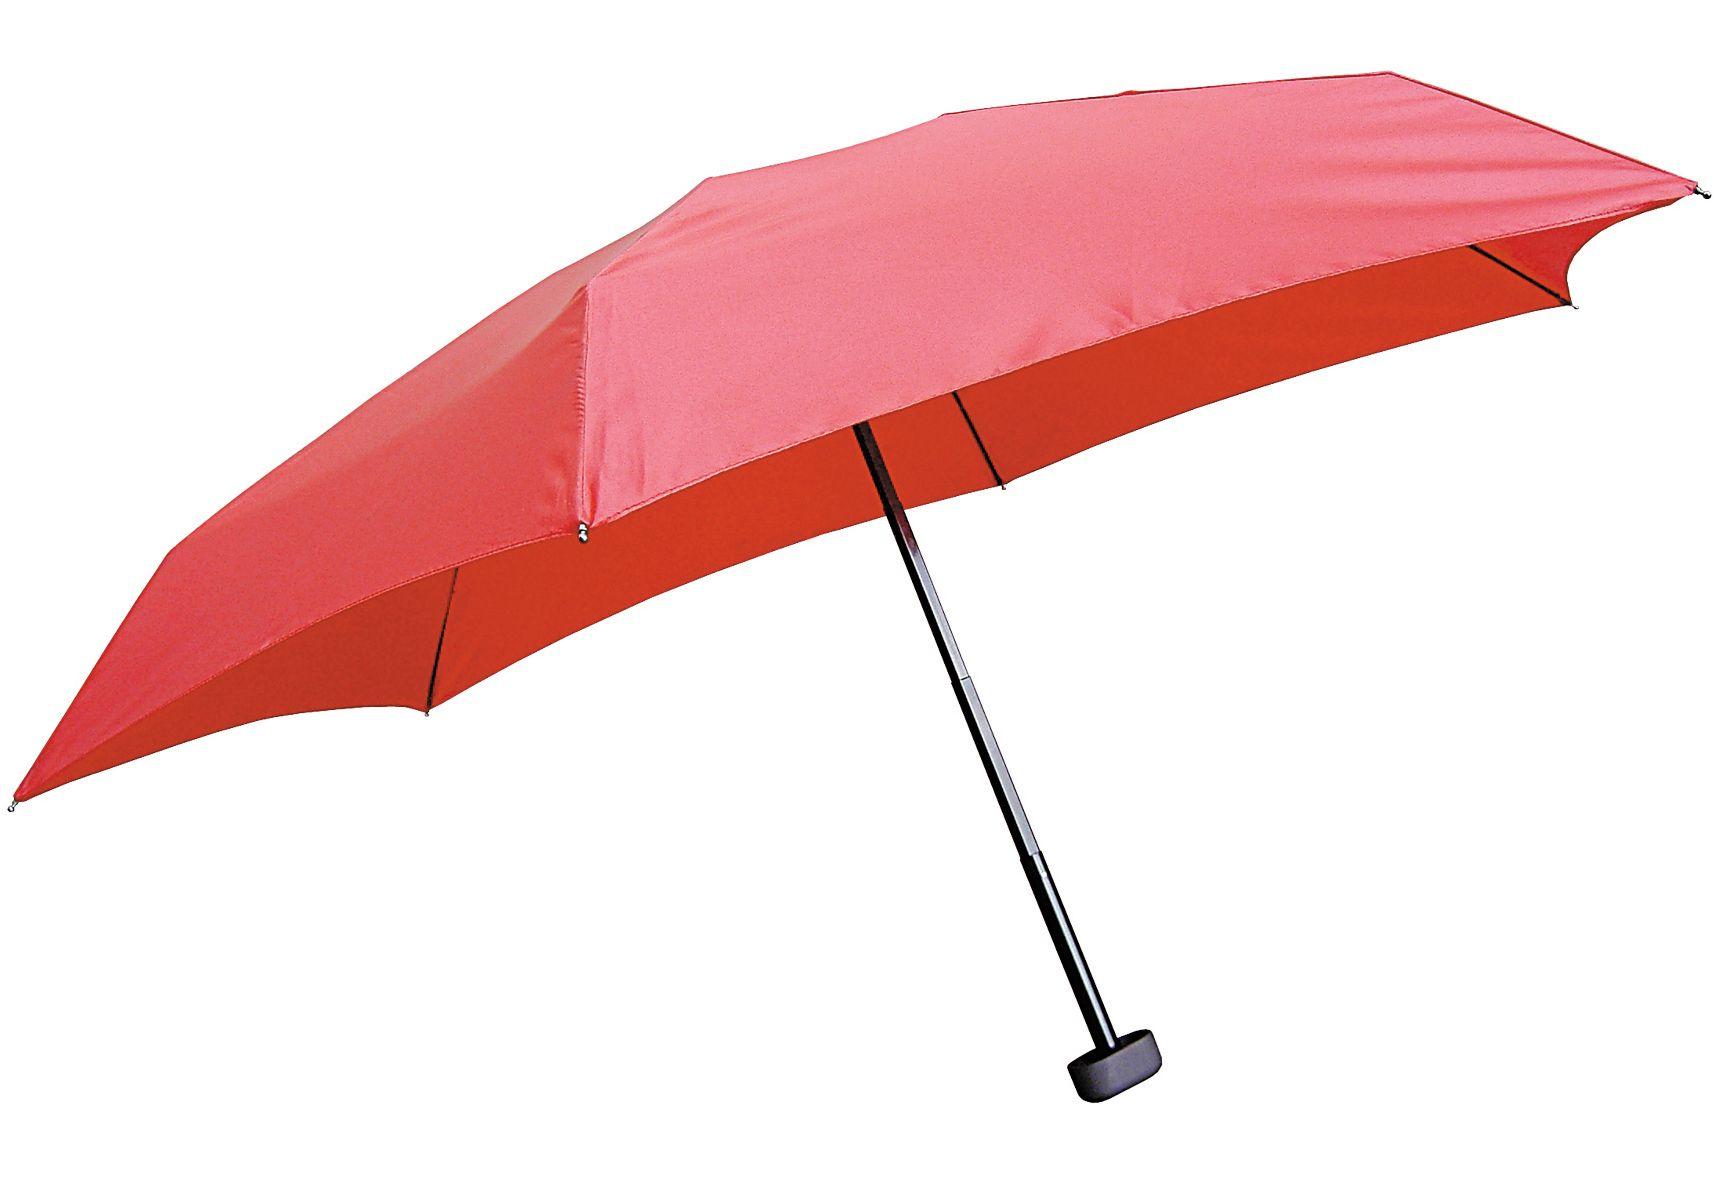 EUROSCHIRM® Euroschirm® Regenschirm Taschenschirm, »Dainty Minireiseschirm«